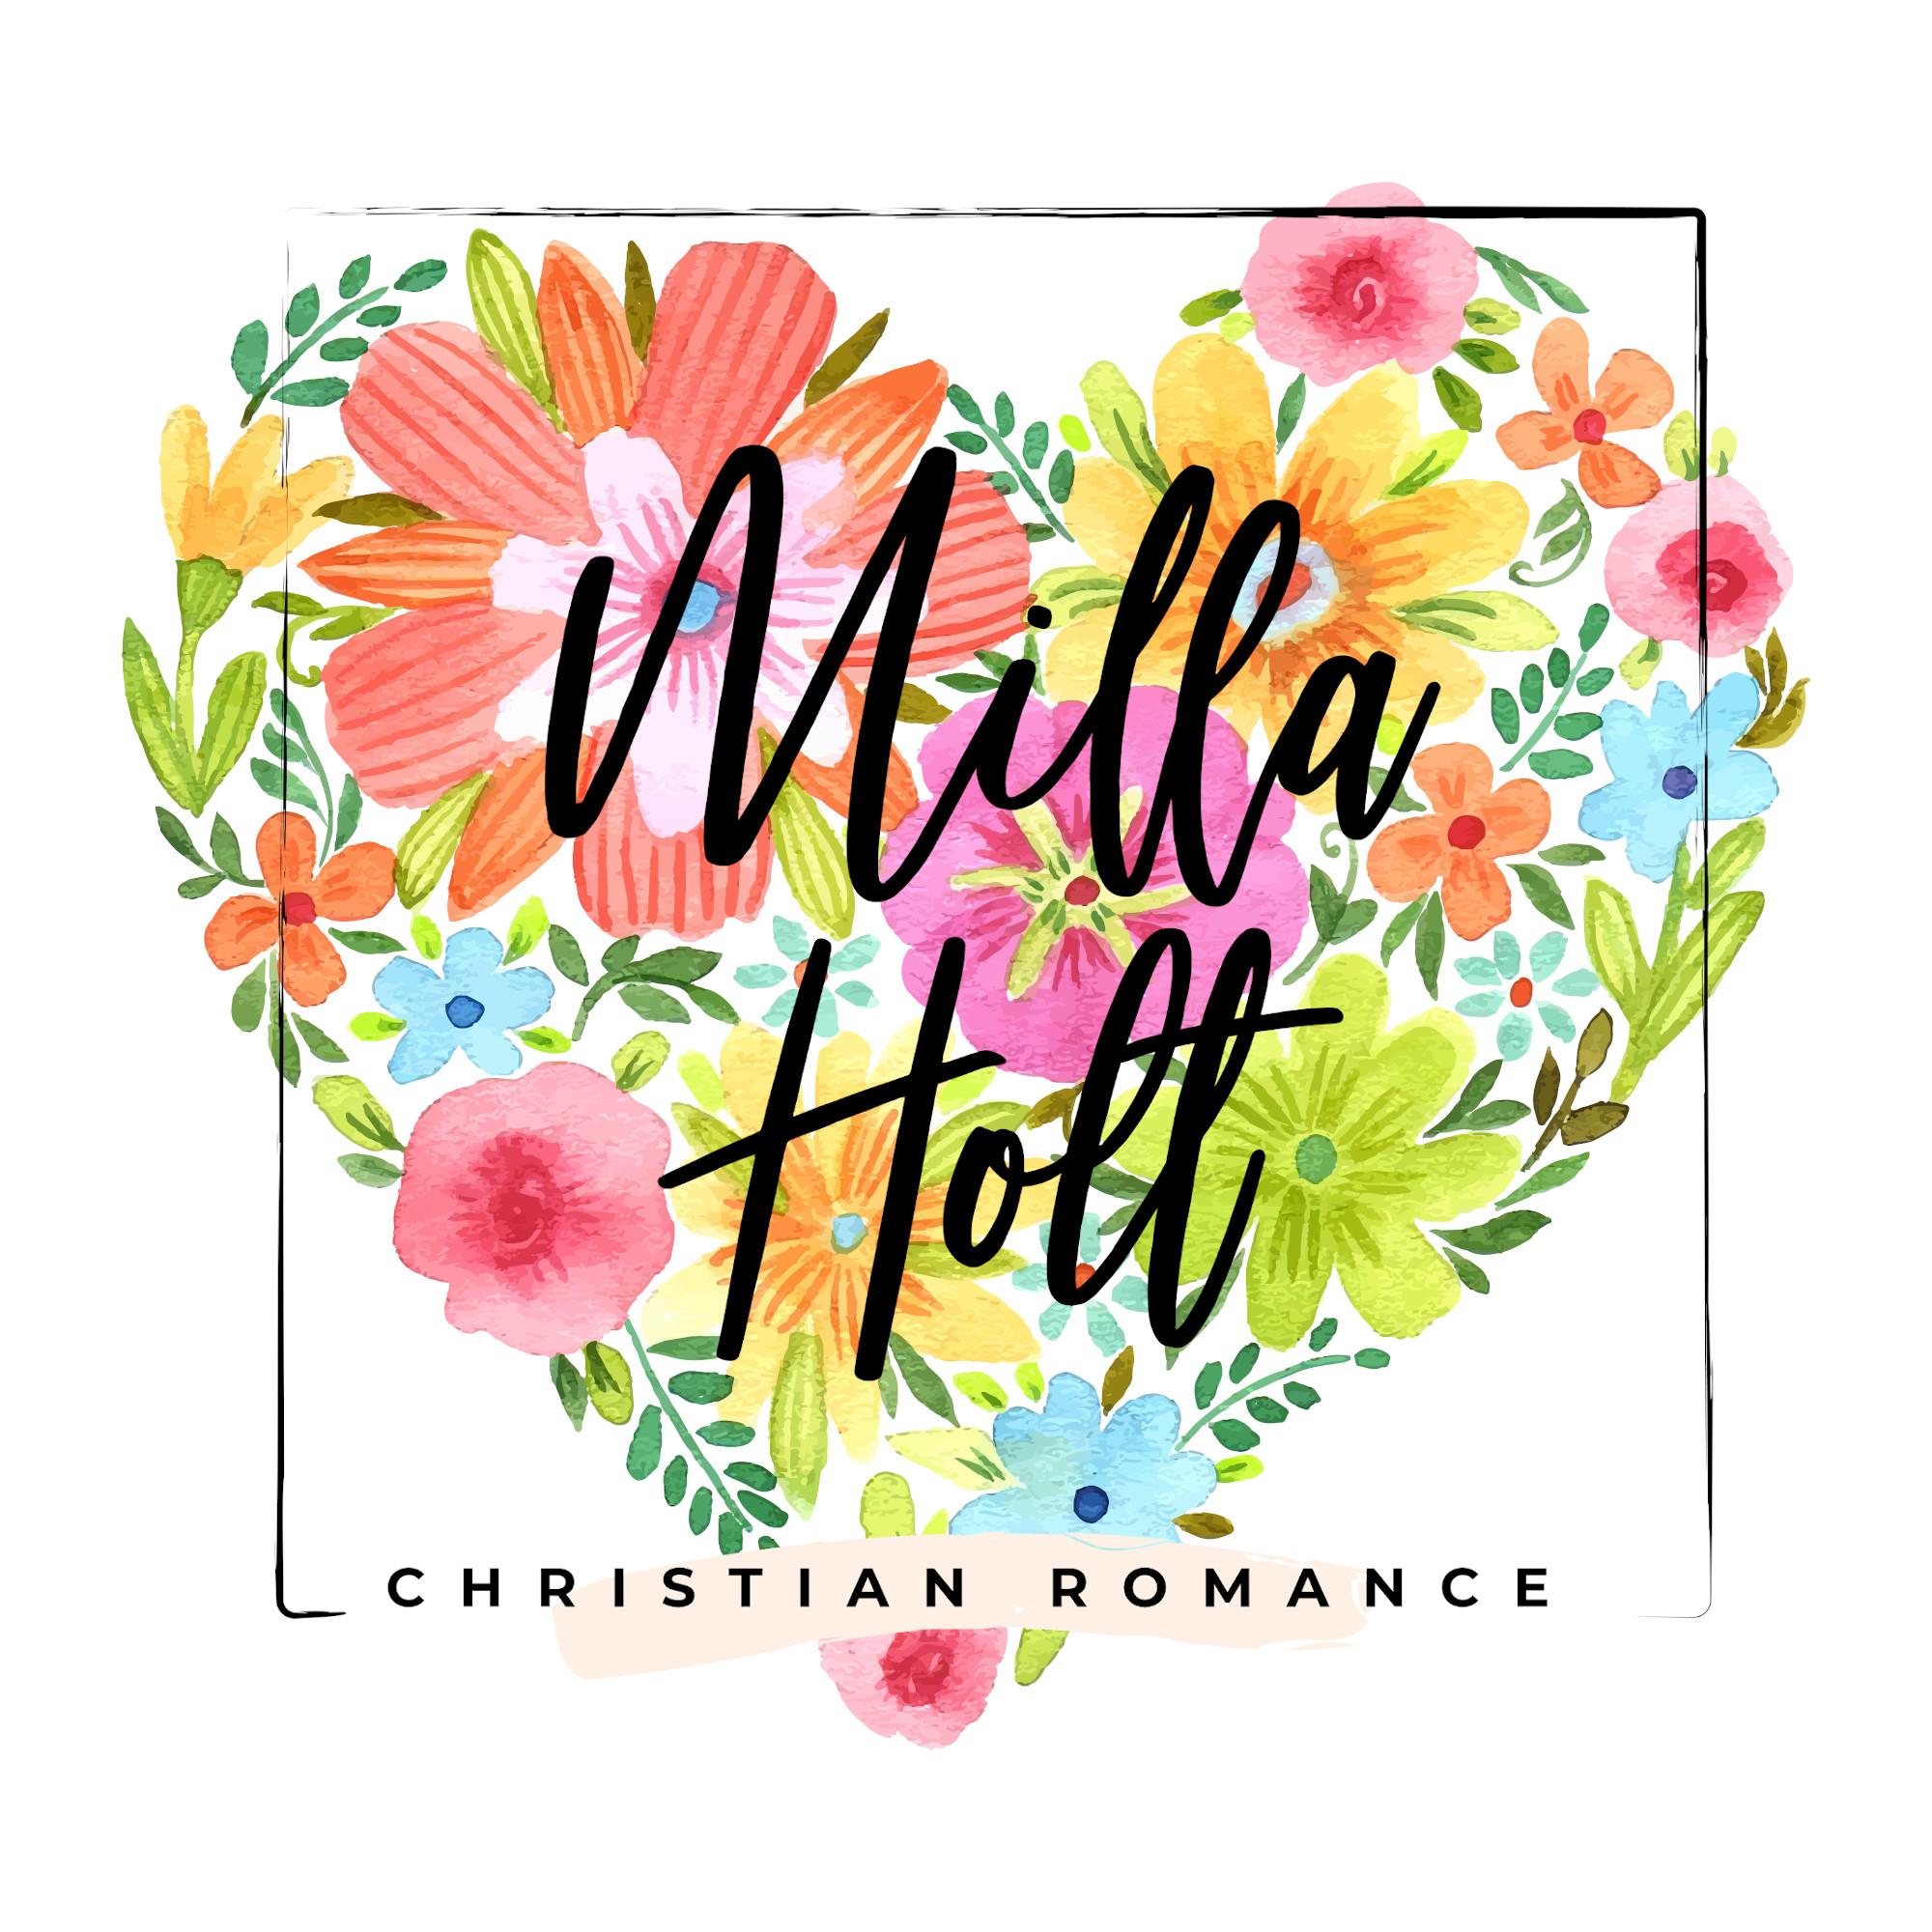 Milla Holt: Inspirational Christian Romance